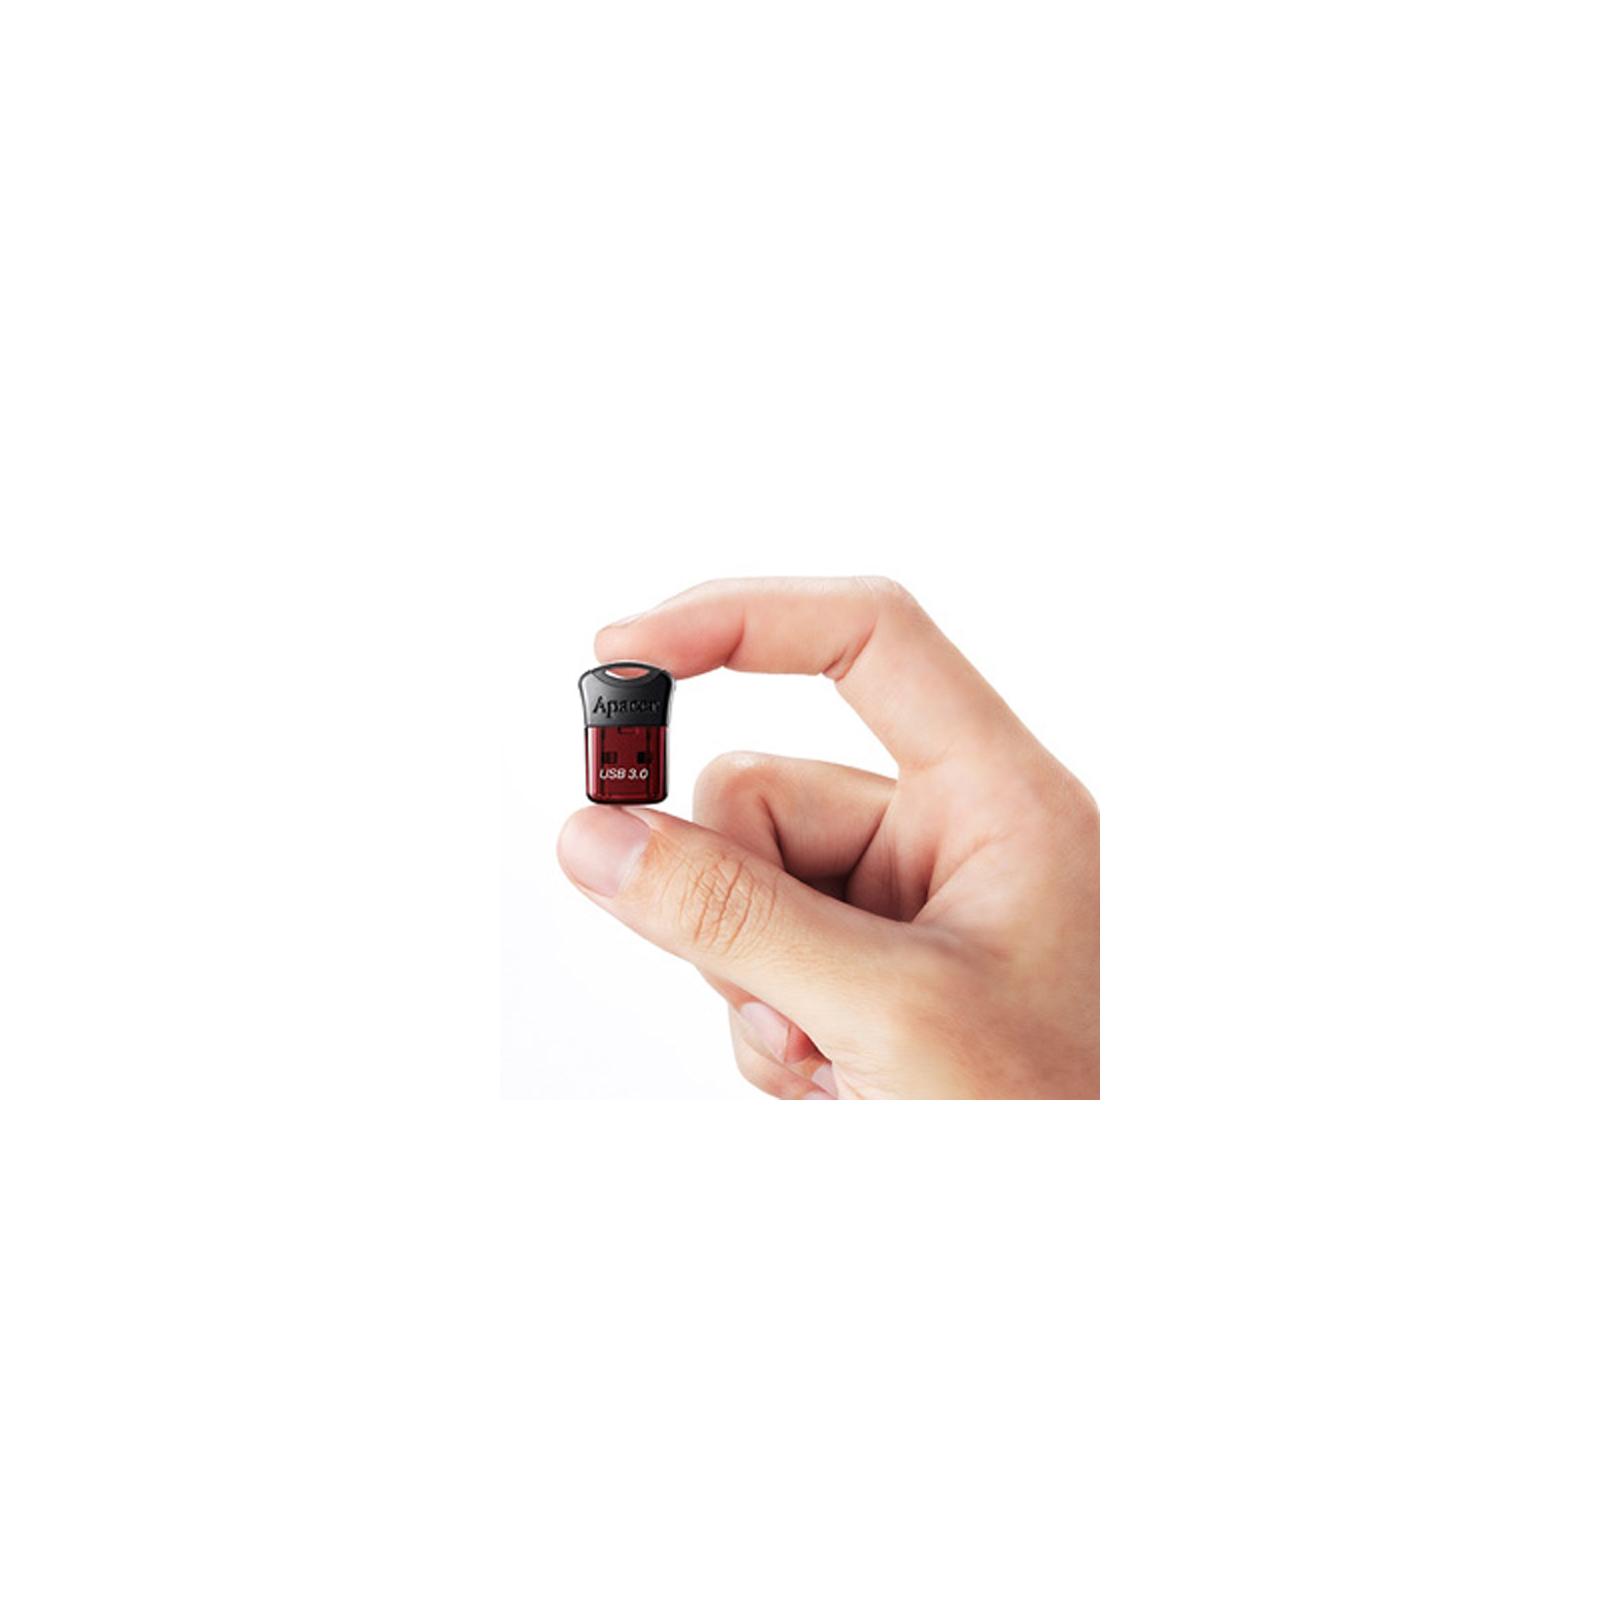 USB флеш накопитель Apacer 8GB AH157 Red USB 3.0 (AP8GAH157R-1) изображение 6